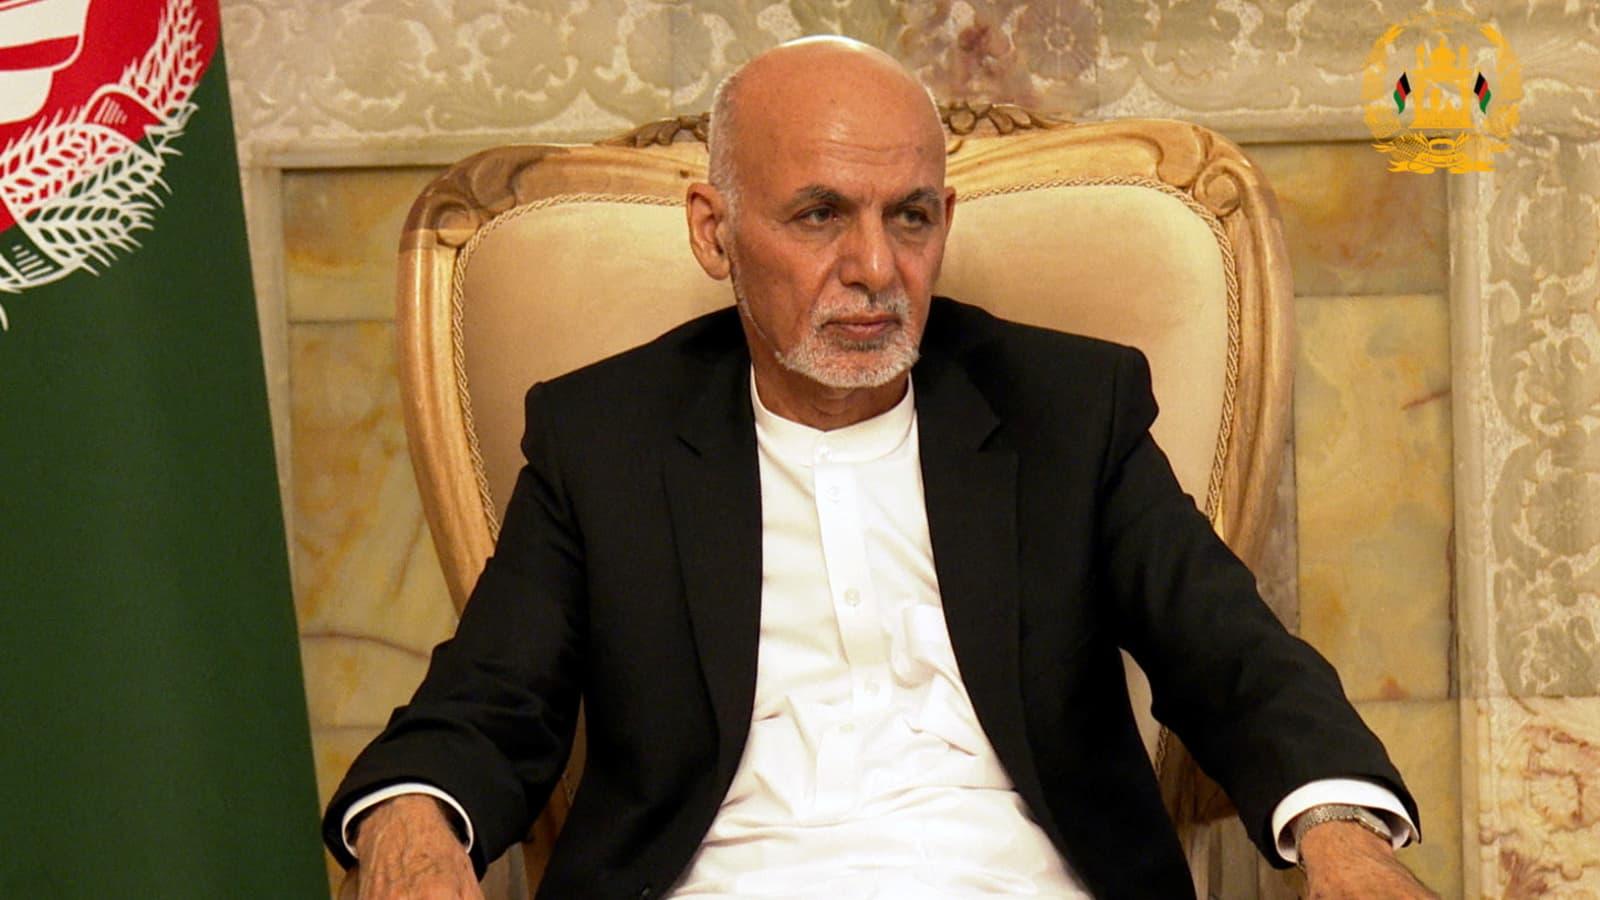 formerafghanpresidentashrafghaniapologizestopeopleofafghanistanafterfleeing